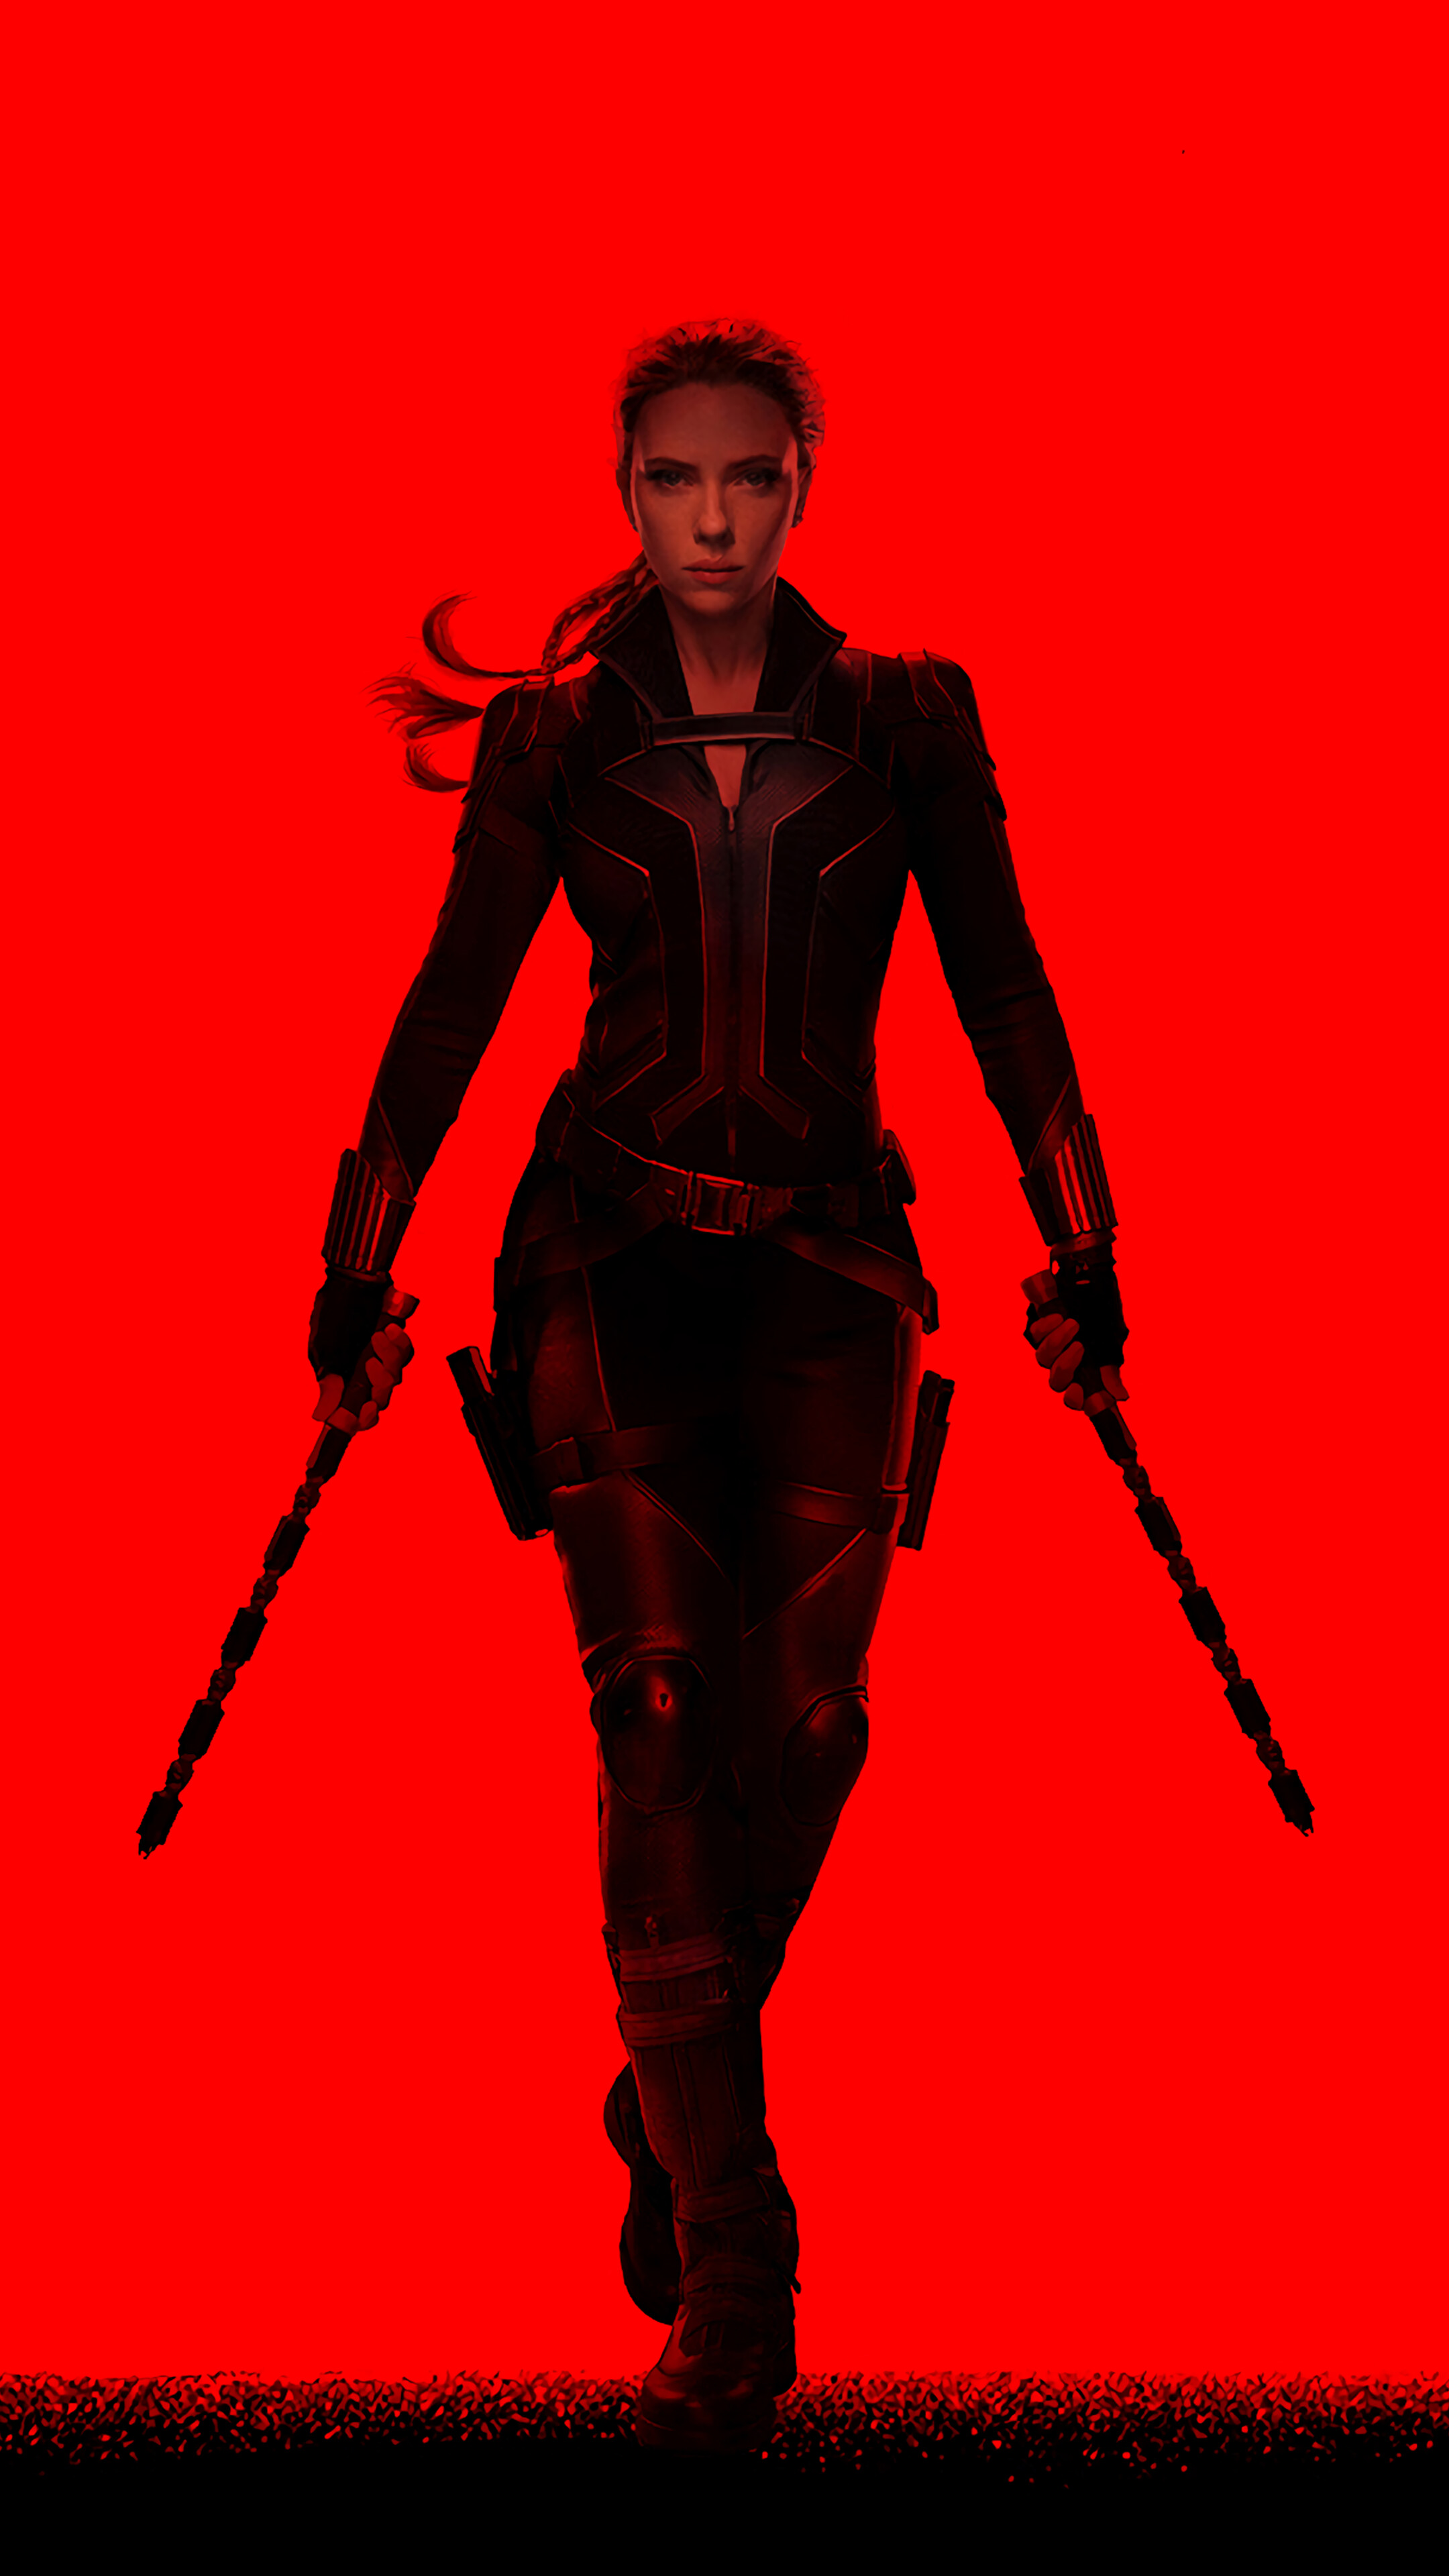 47] Black Widow 2020 Wallpapers on WallpaperSafari 2160x3840